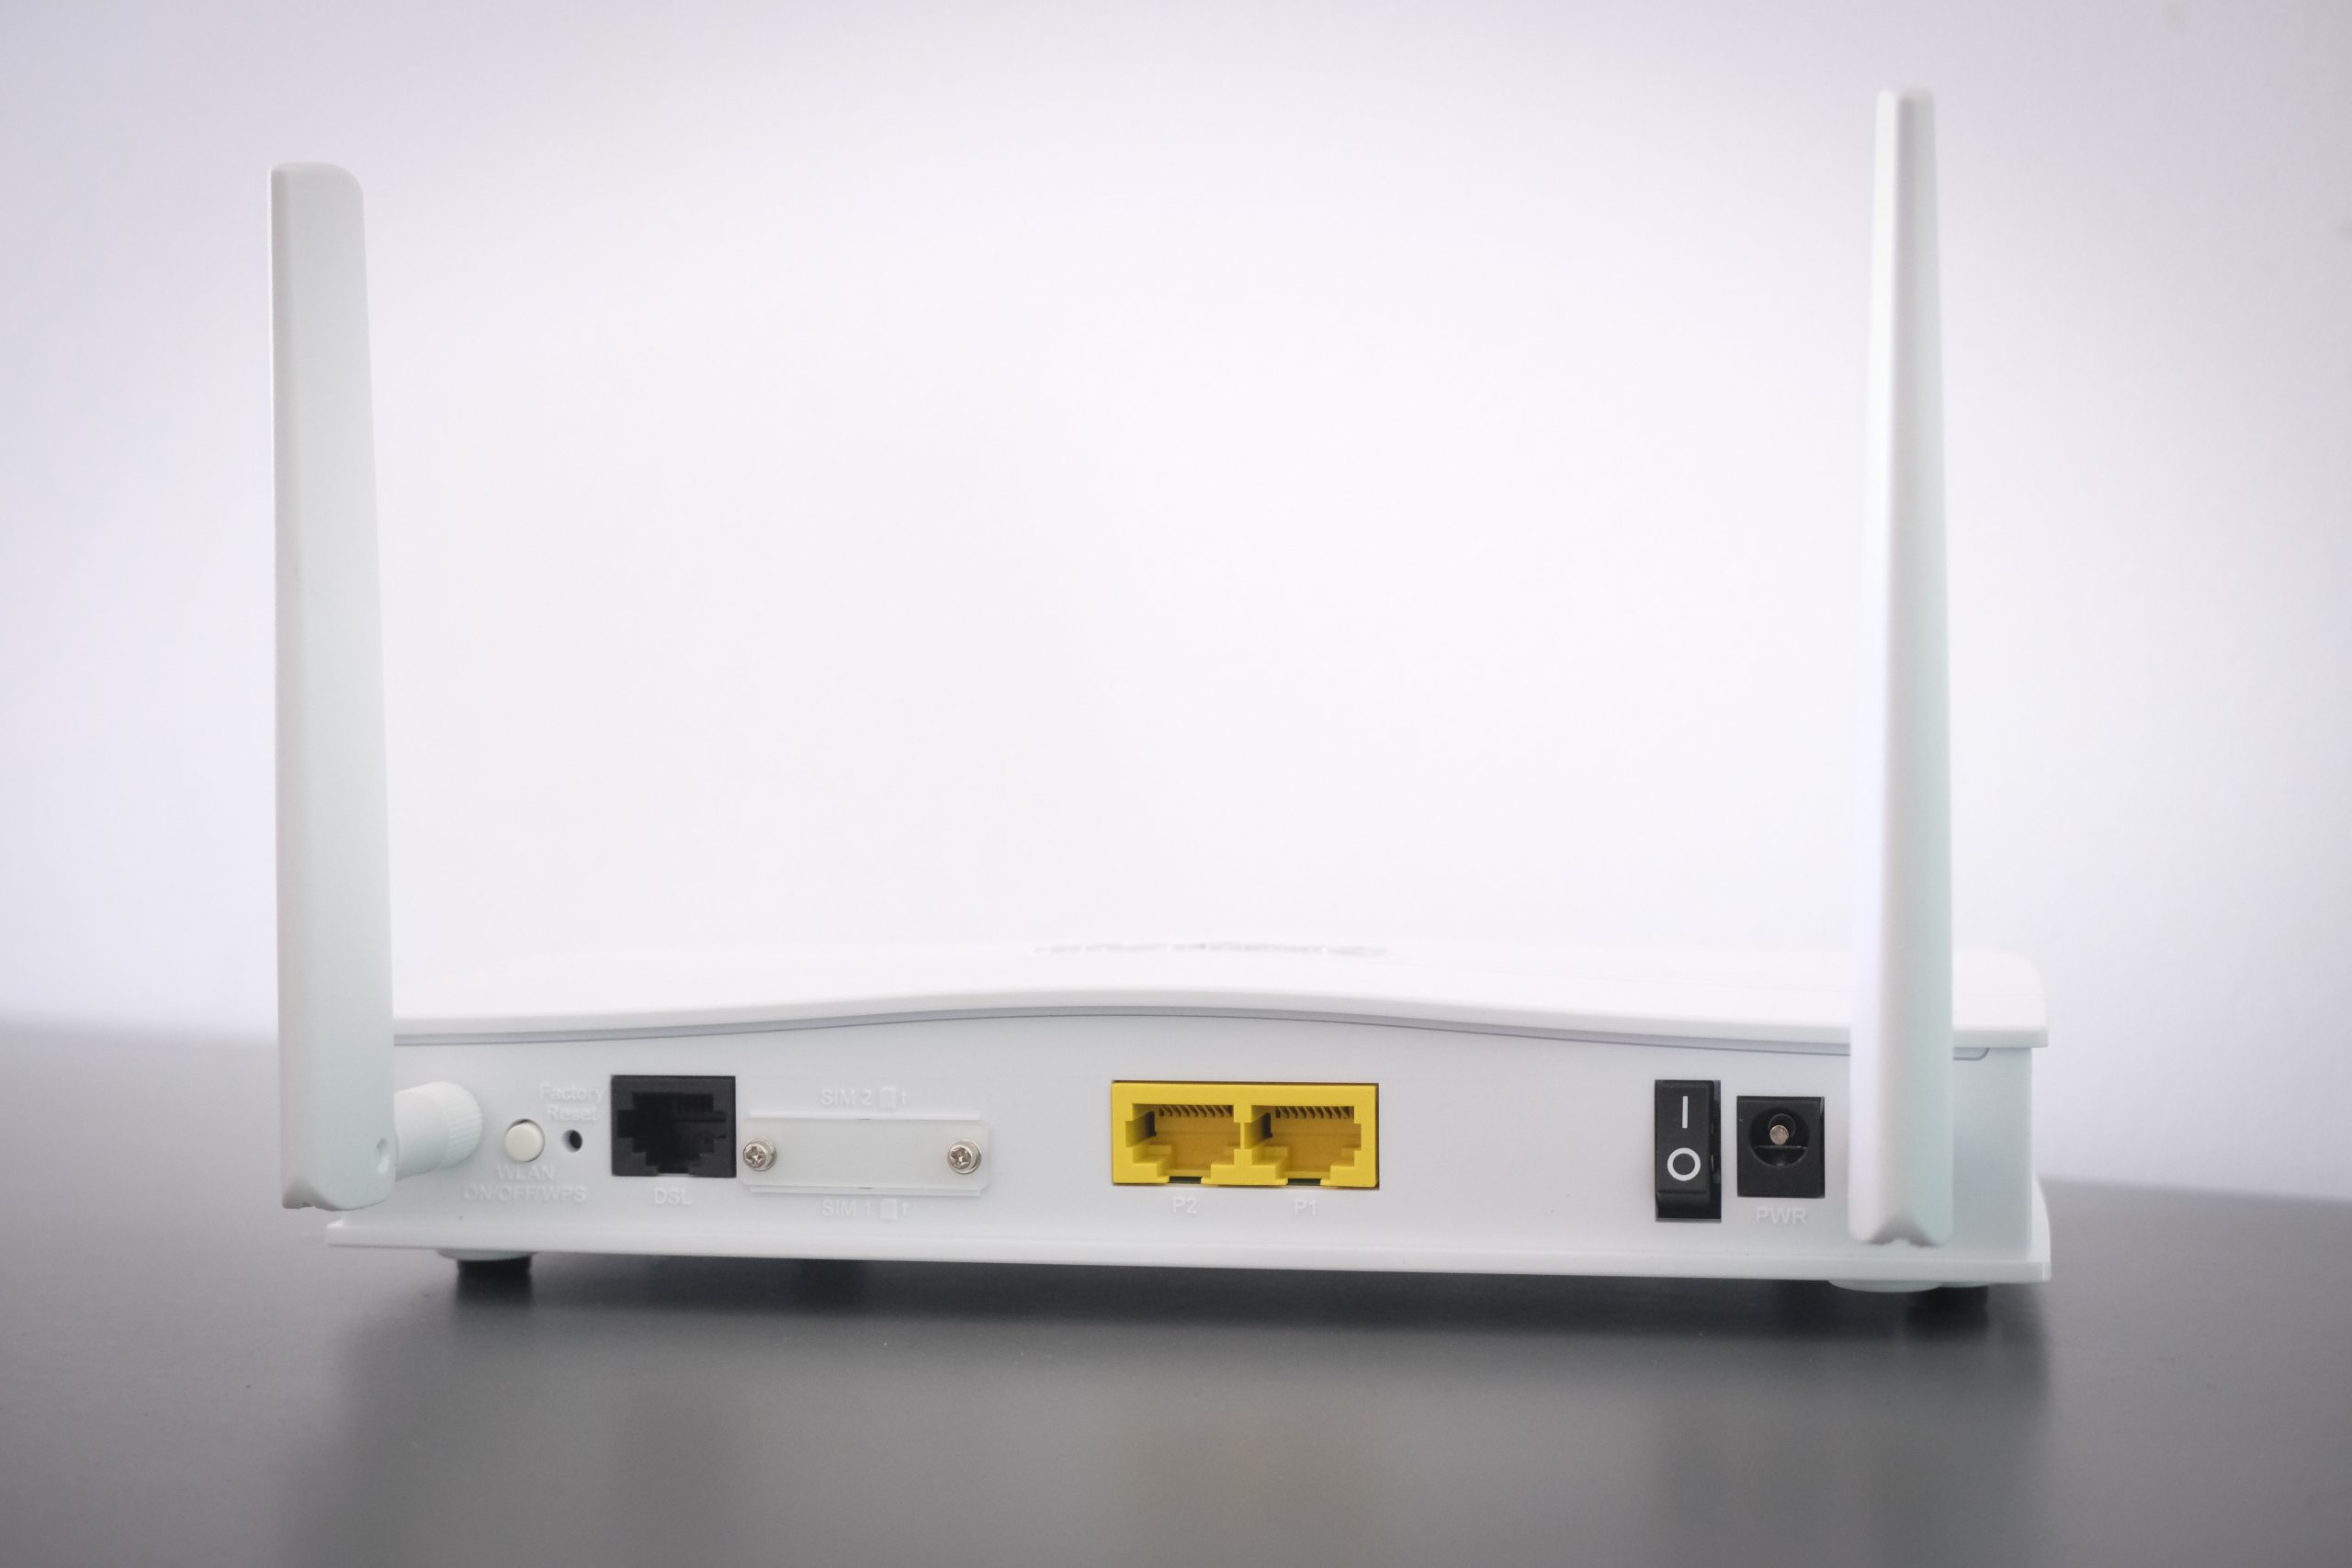 Posisi Router Wifi